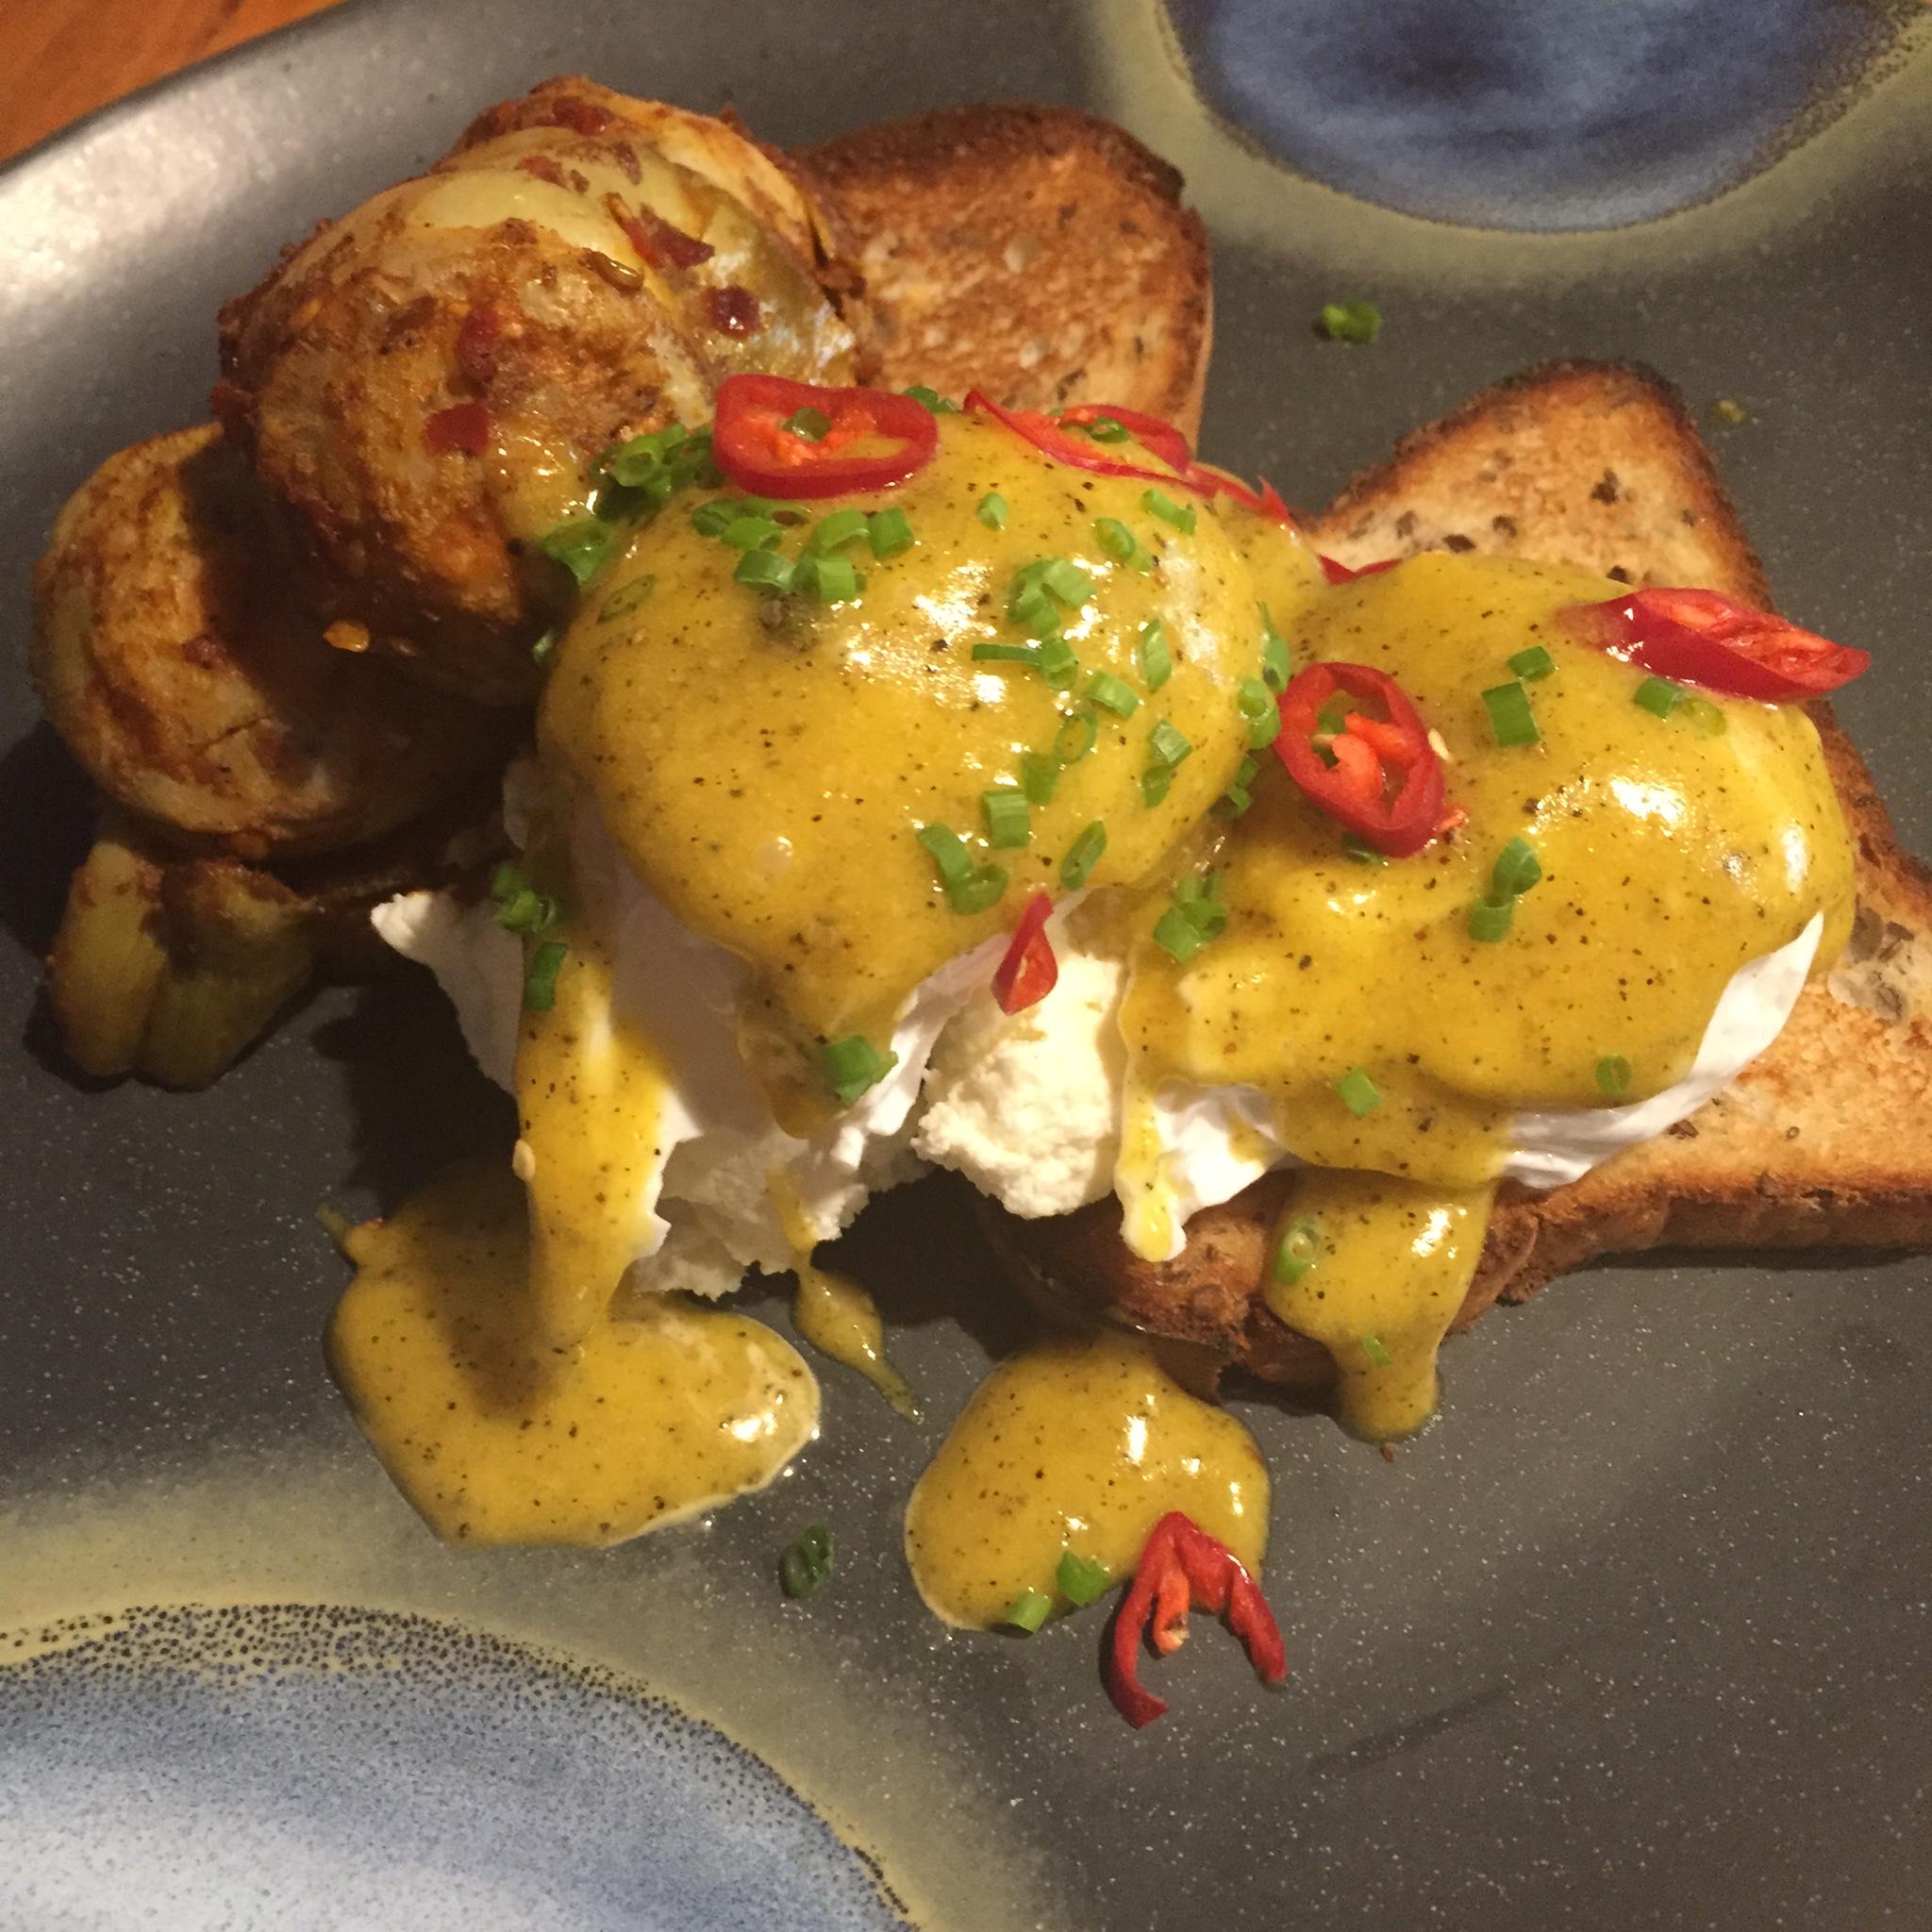 eggs ryan gosling - hot, just like it should be